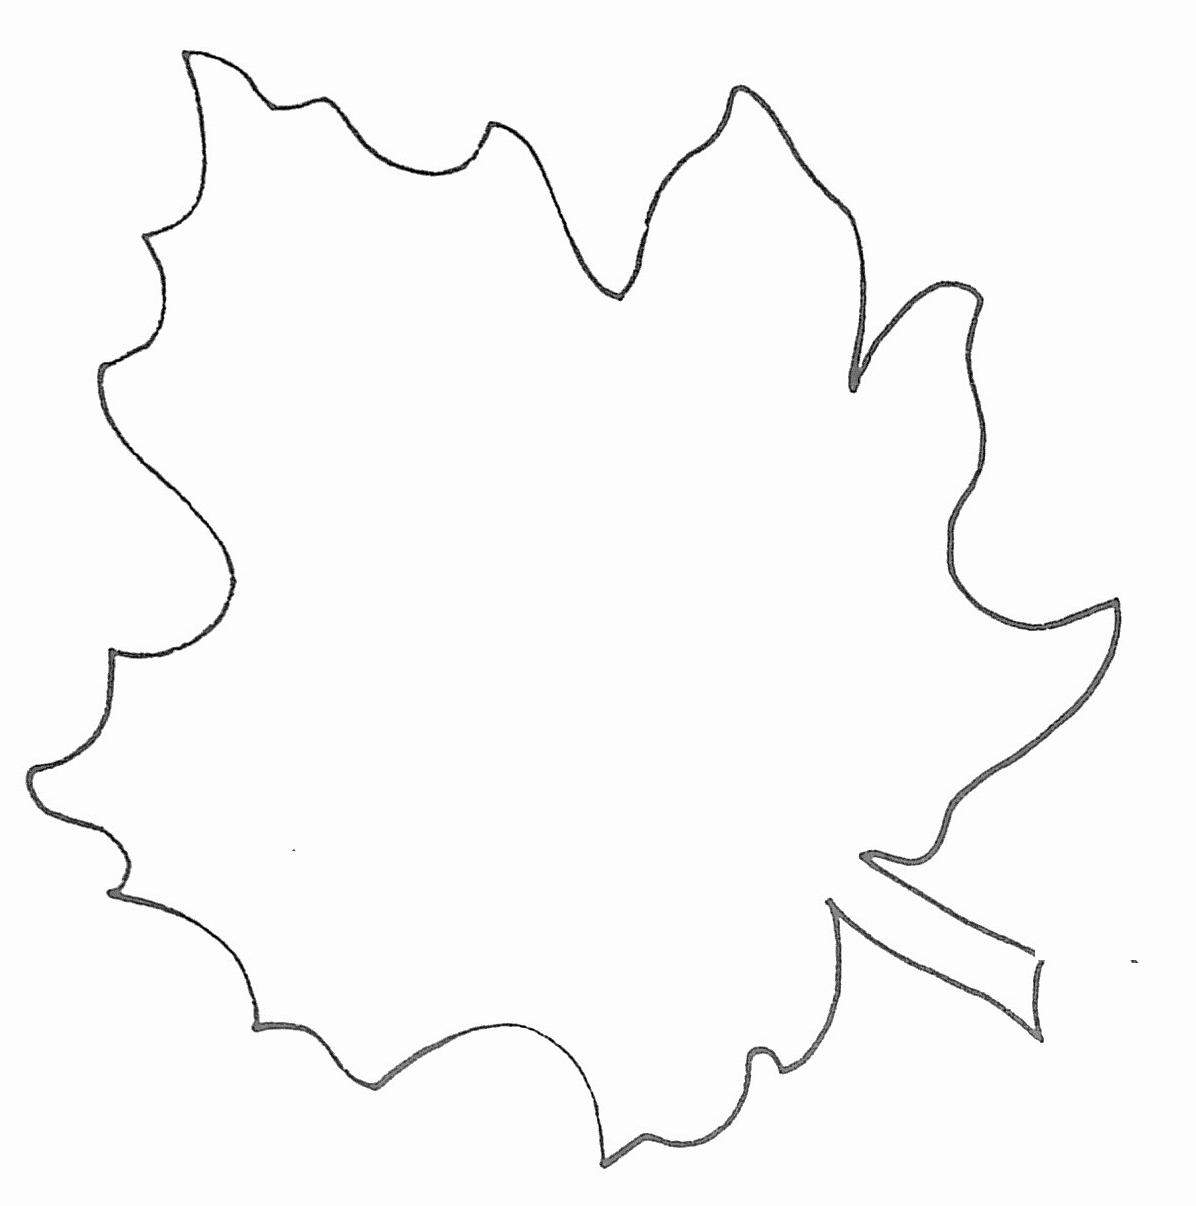 Free Printable Leaf Template | Mathosproject - Free Printable Leaf Template